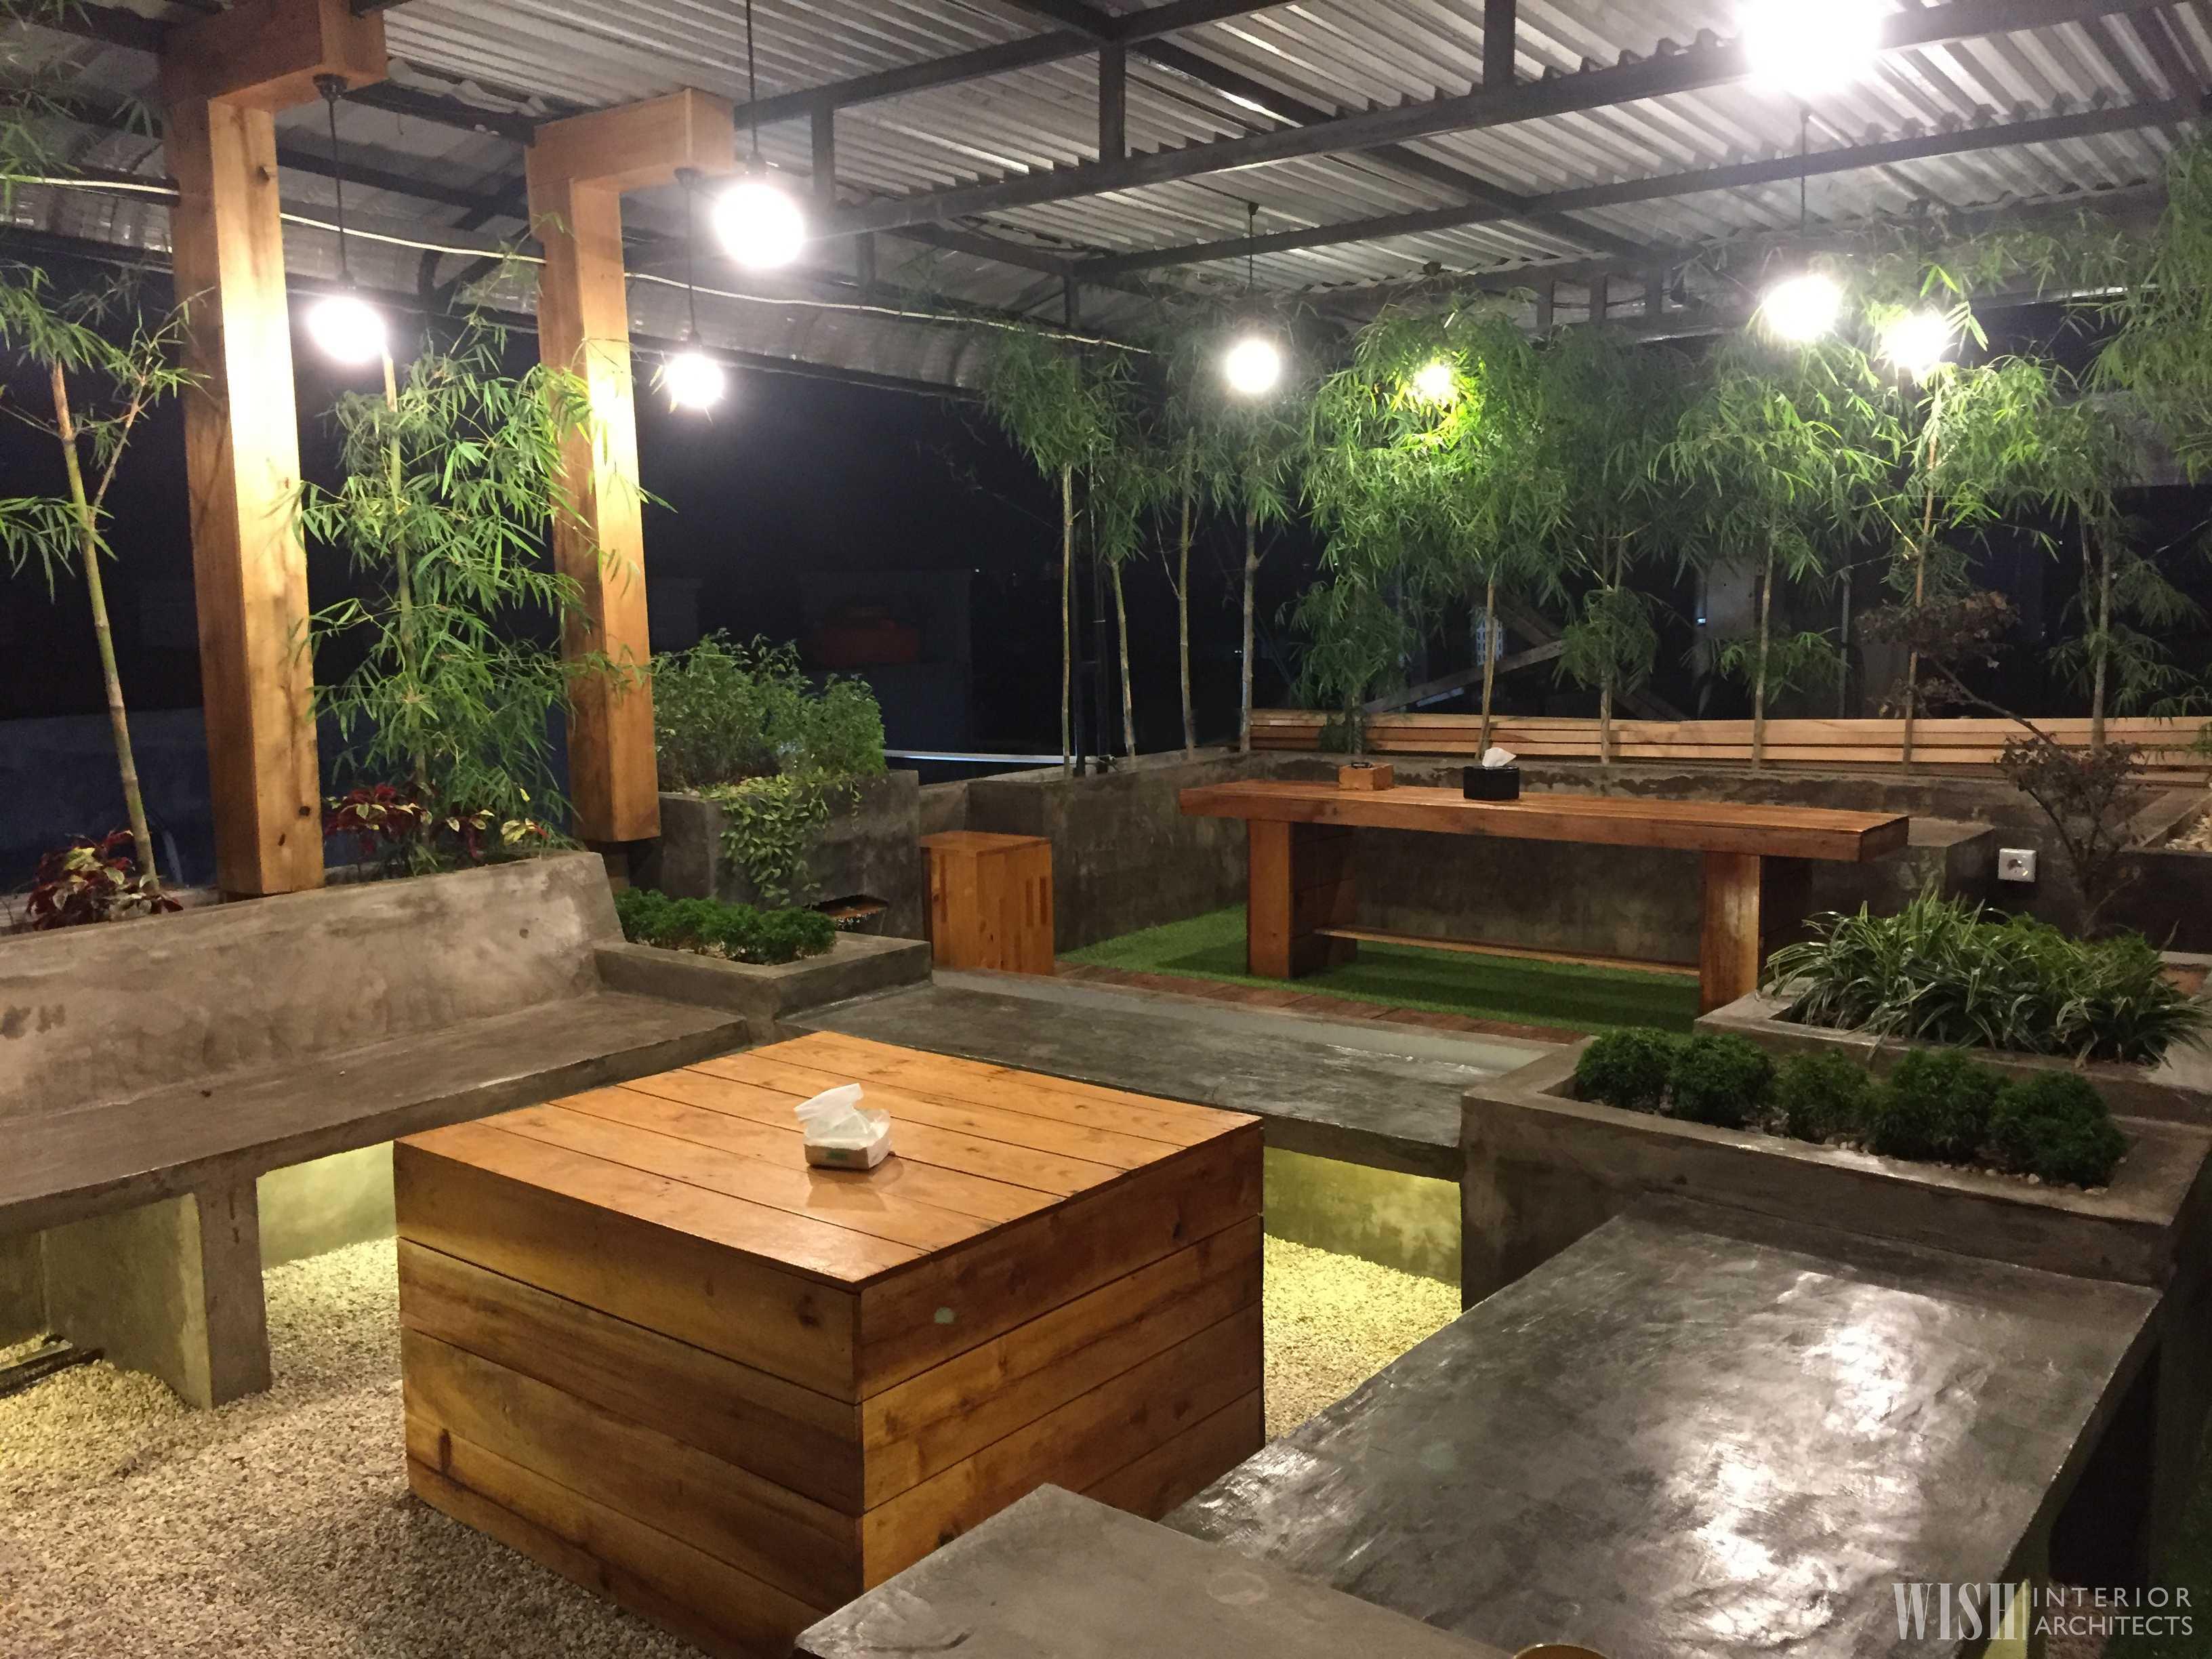 Wish Interior+Architects V Rooftop Garden Pekanbaru Pekanbaru Rooftop Area - Night   28289